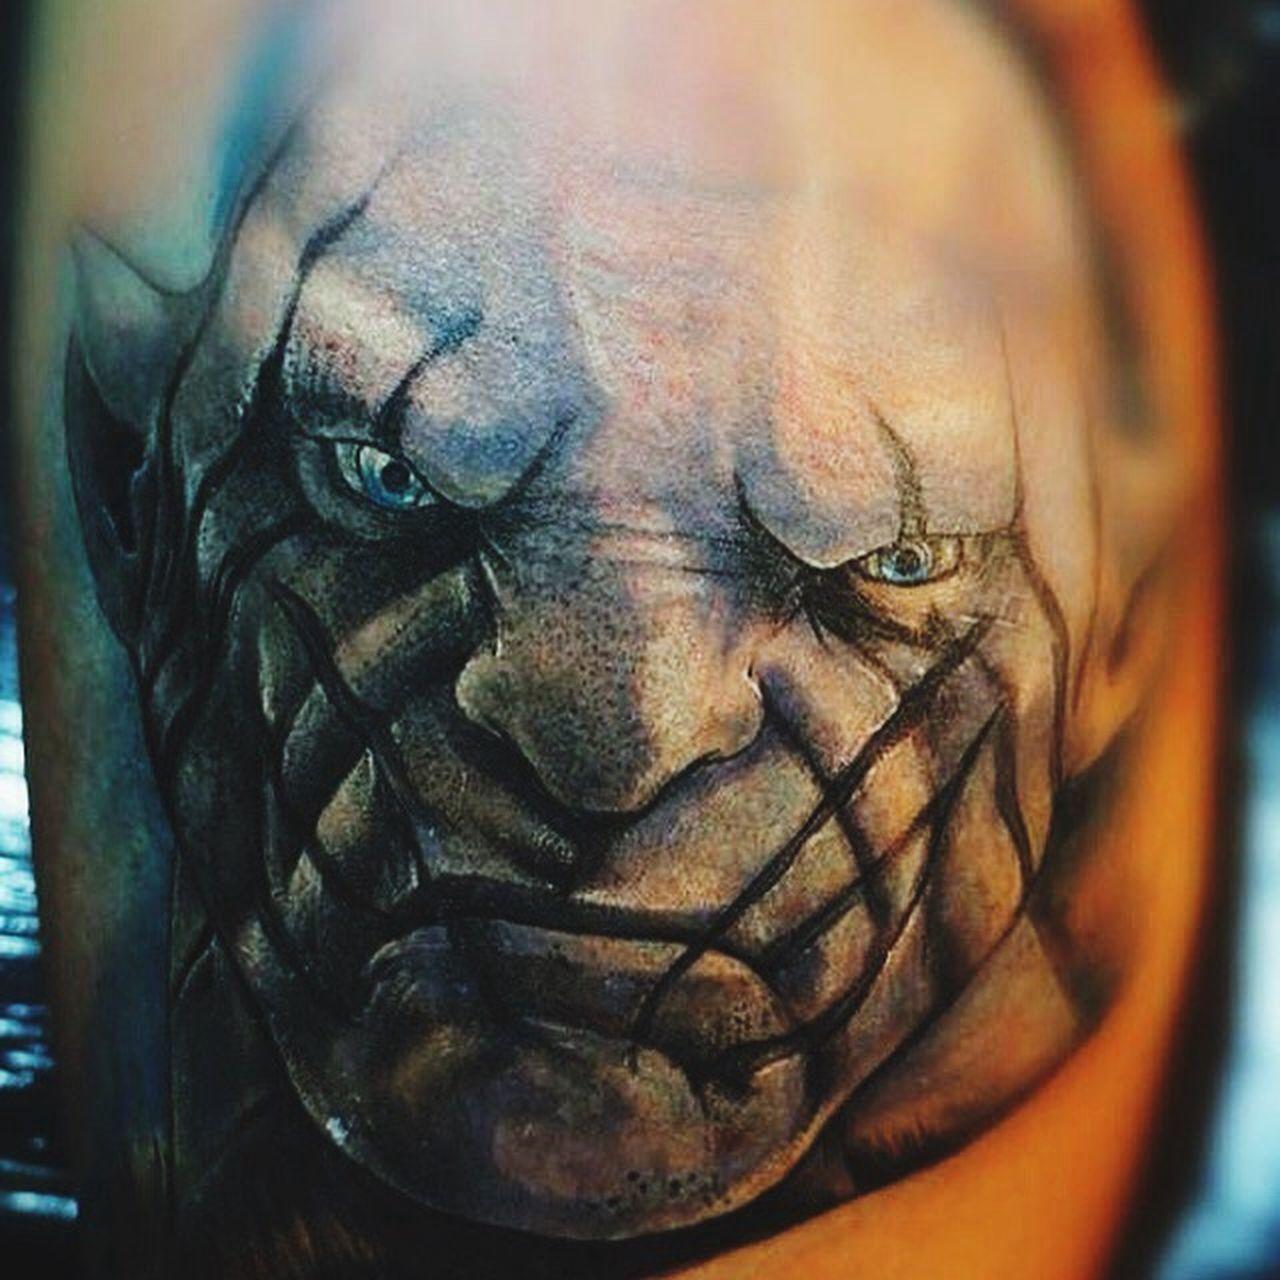 Tattoo Ork That's Me Hello World Popular Photos Tattooed ArtWork